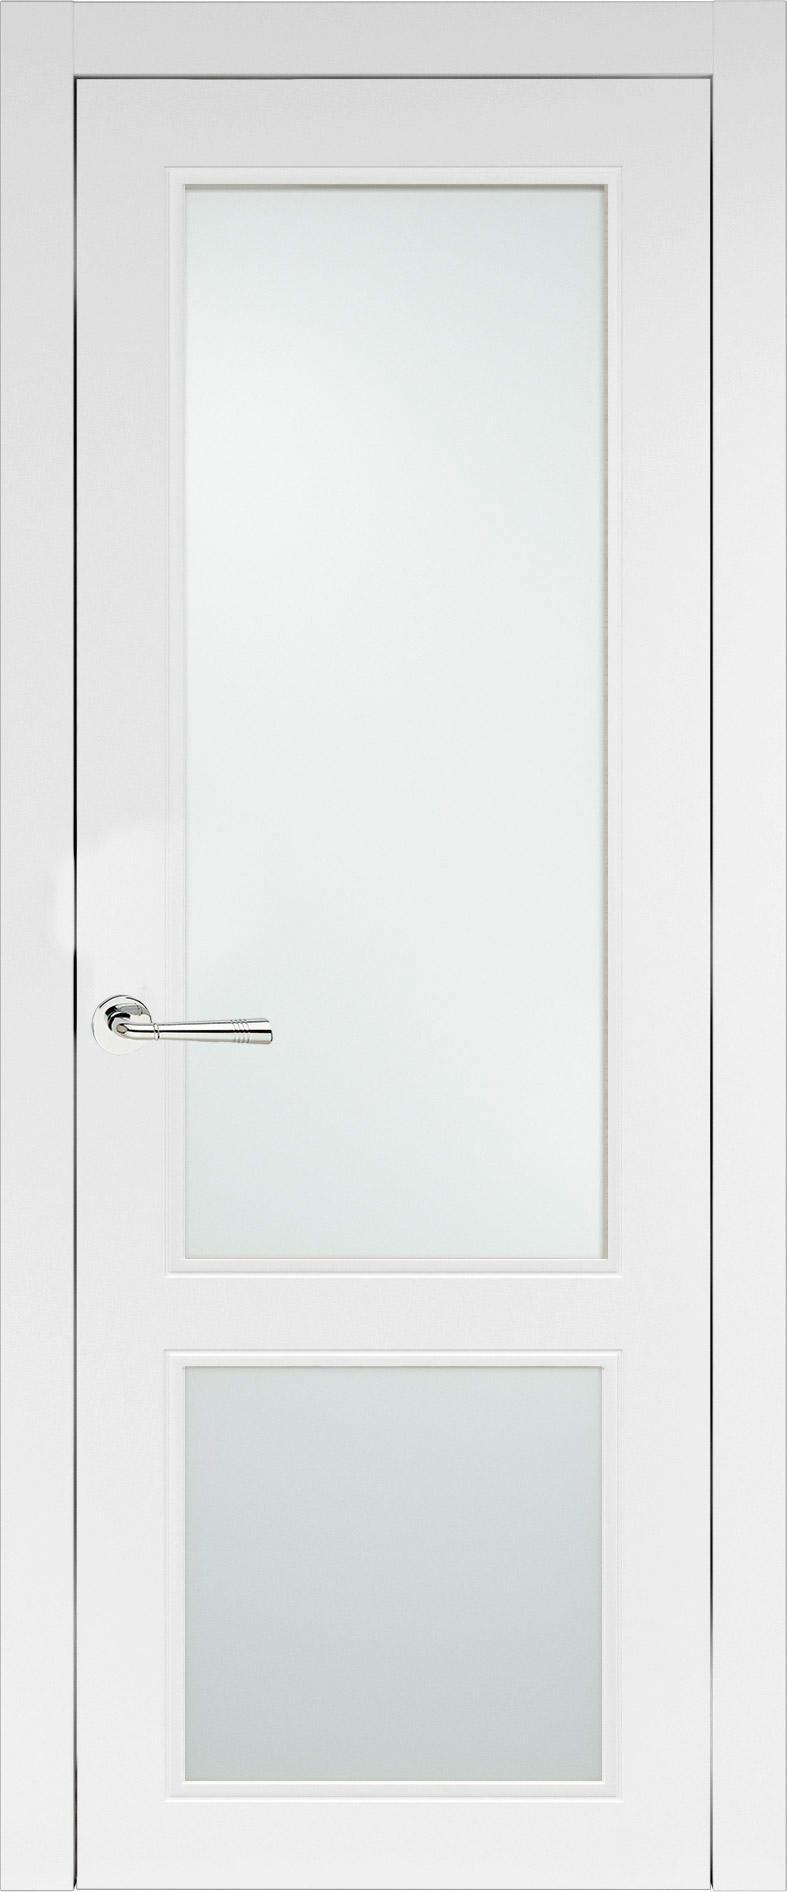 Dinastia Neo Classic цвет - Белая эмаль (RAL 9003) Со стеклом (ДО)